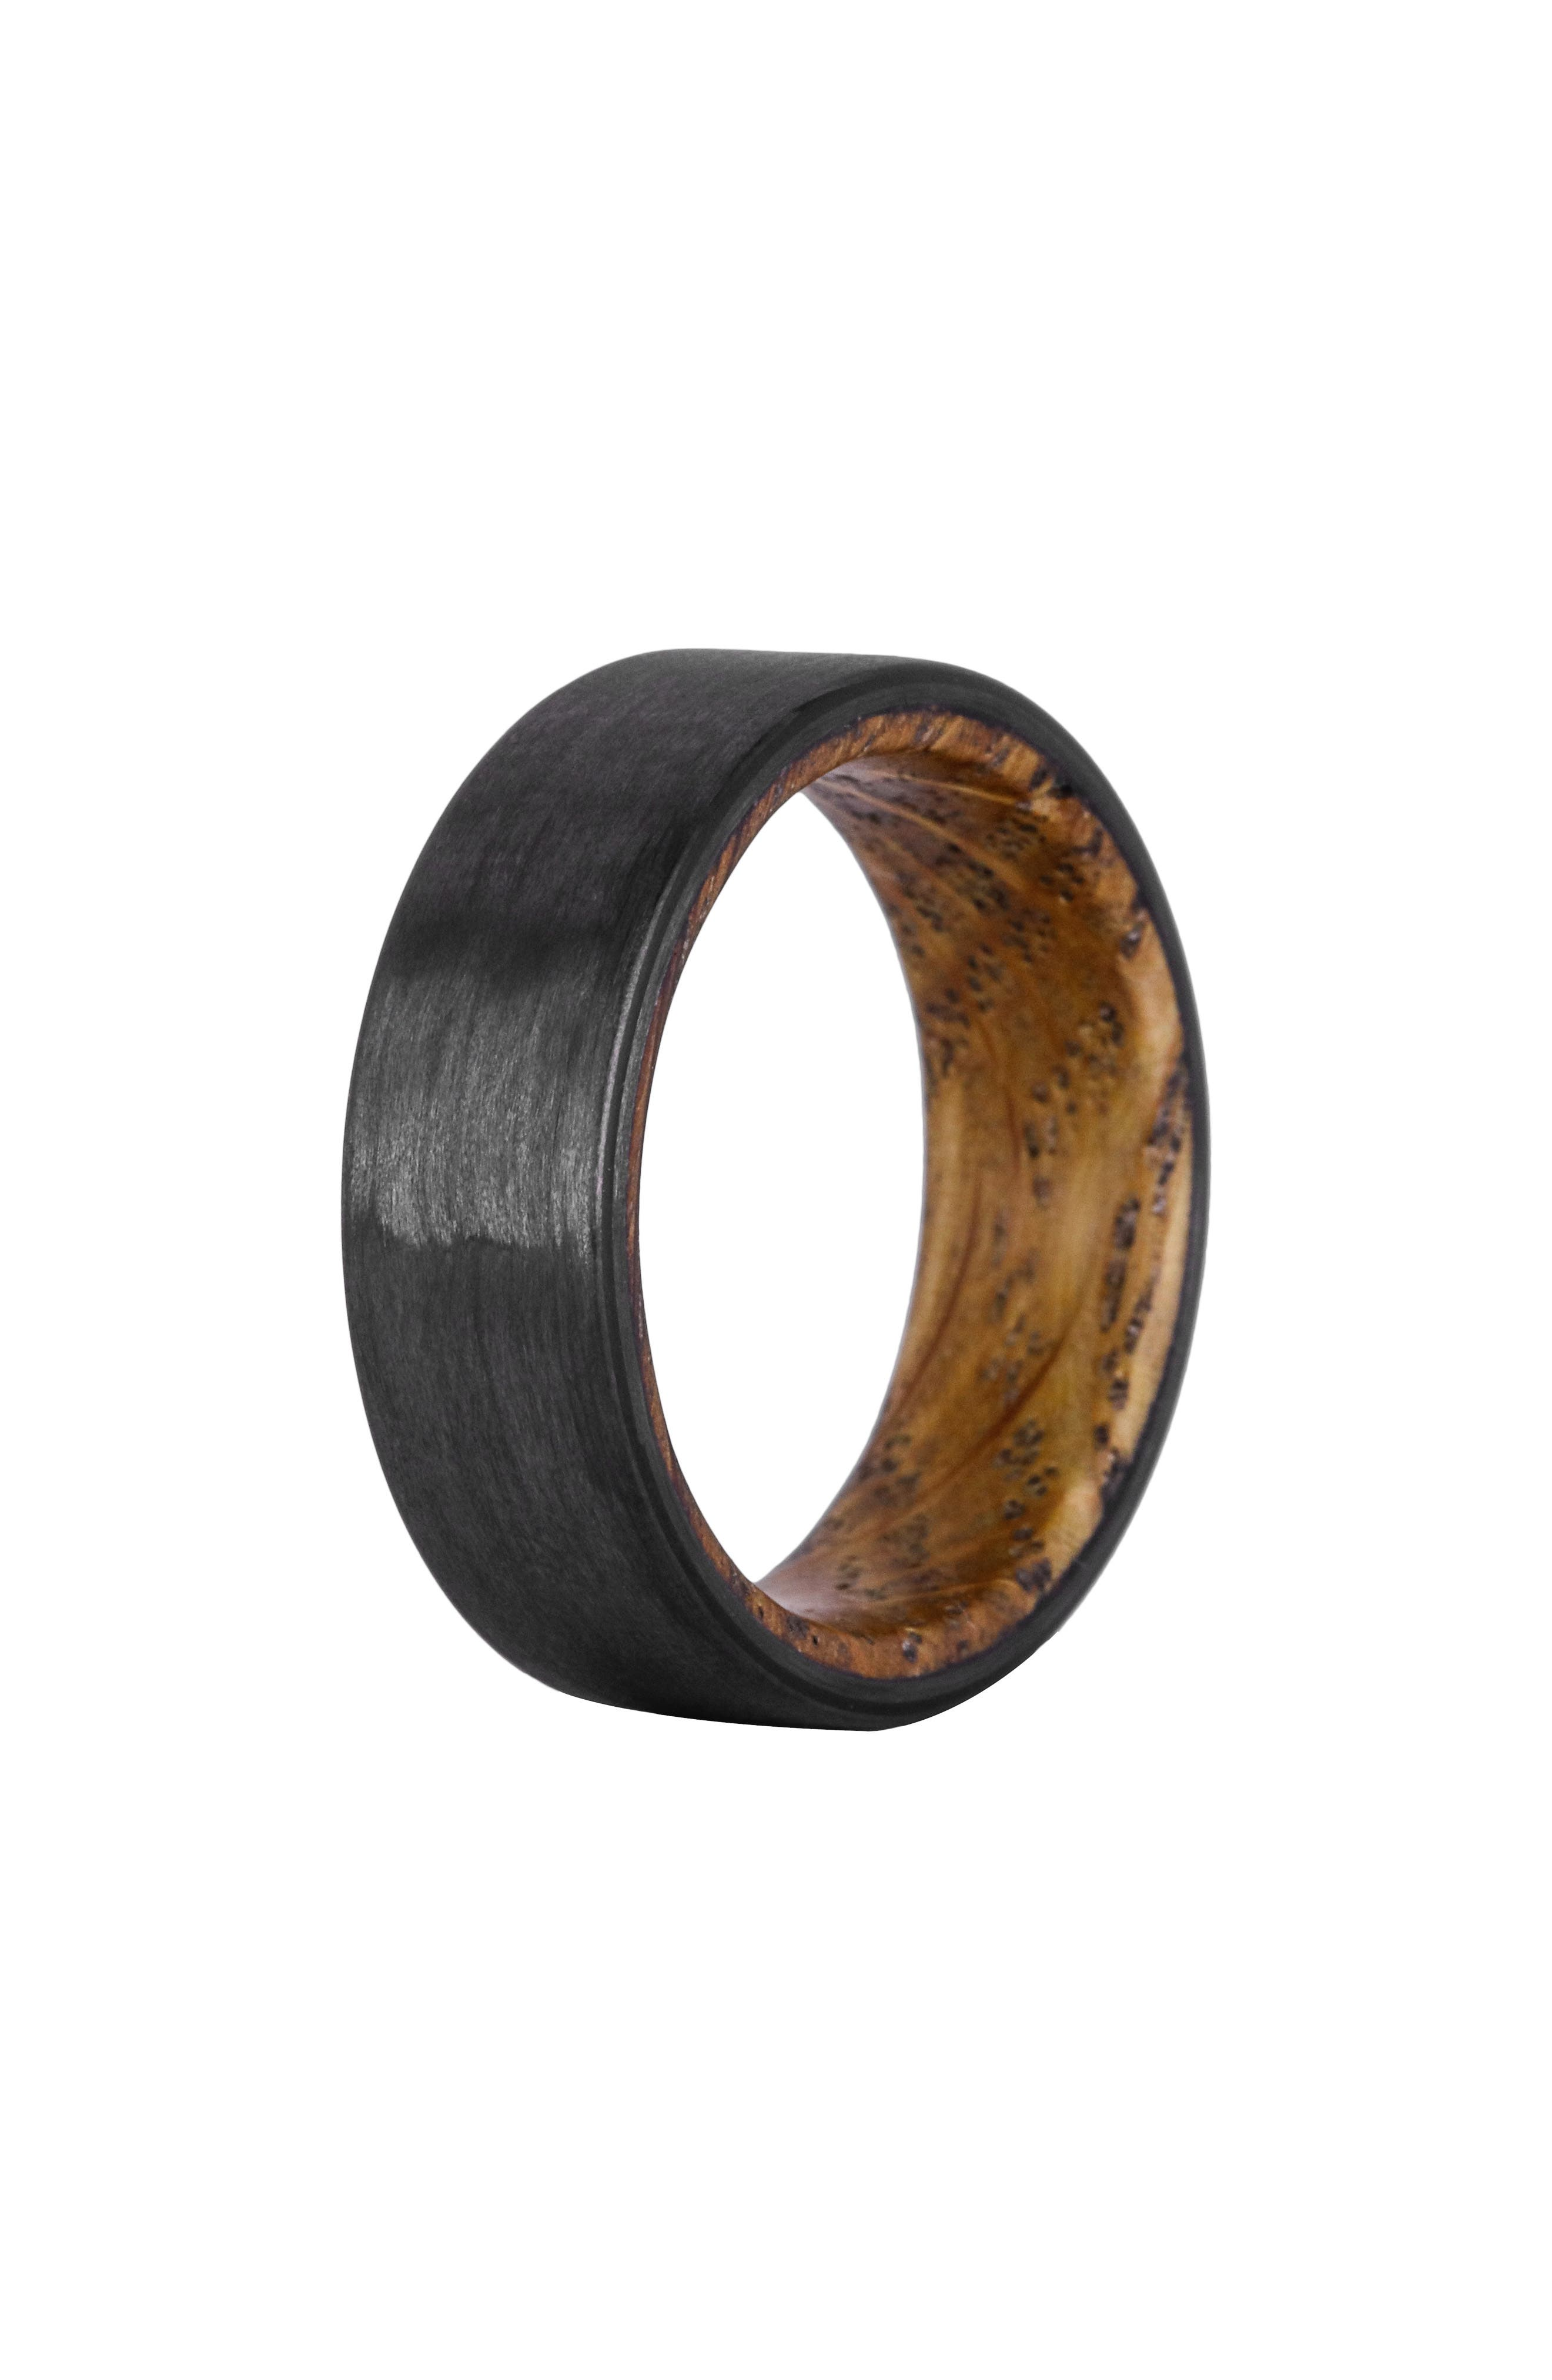 Whiskey Barrel Wood & Carbon Fiber Ring